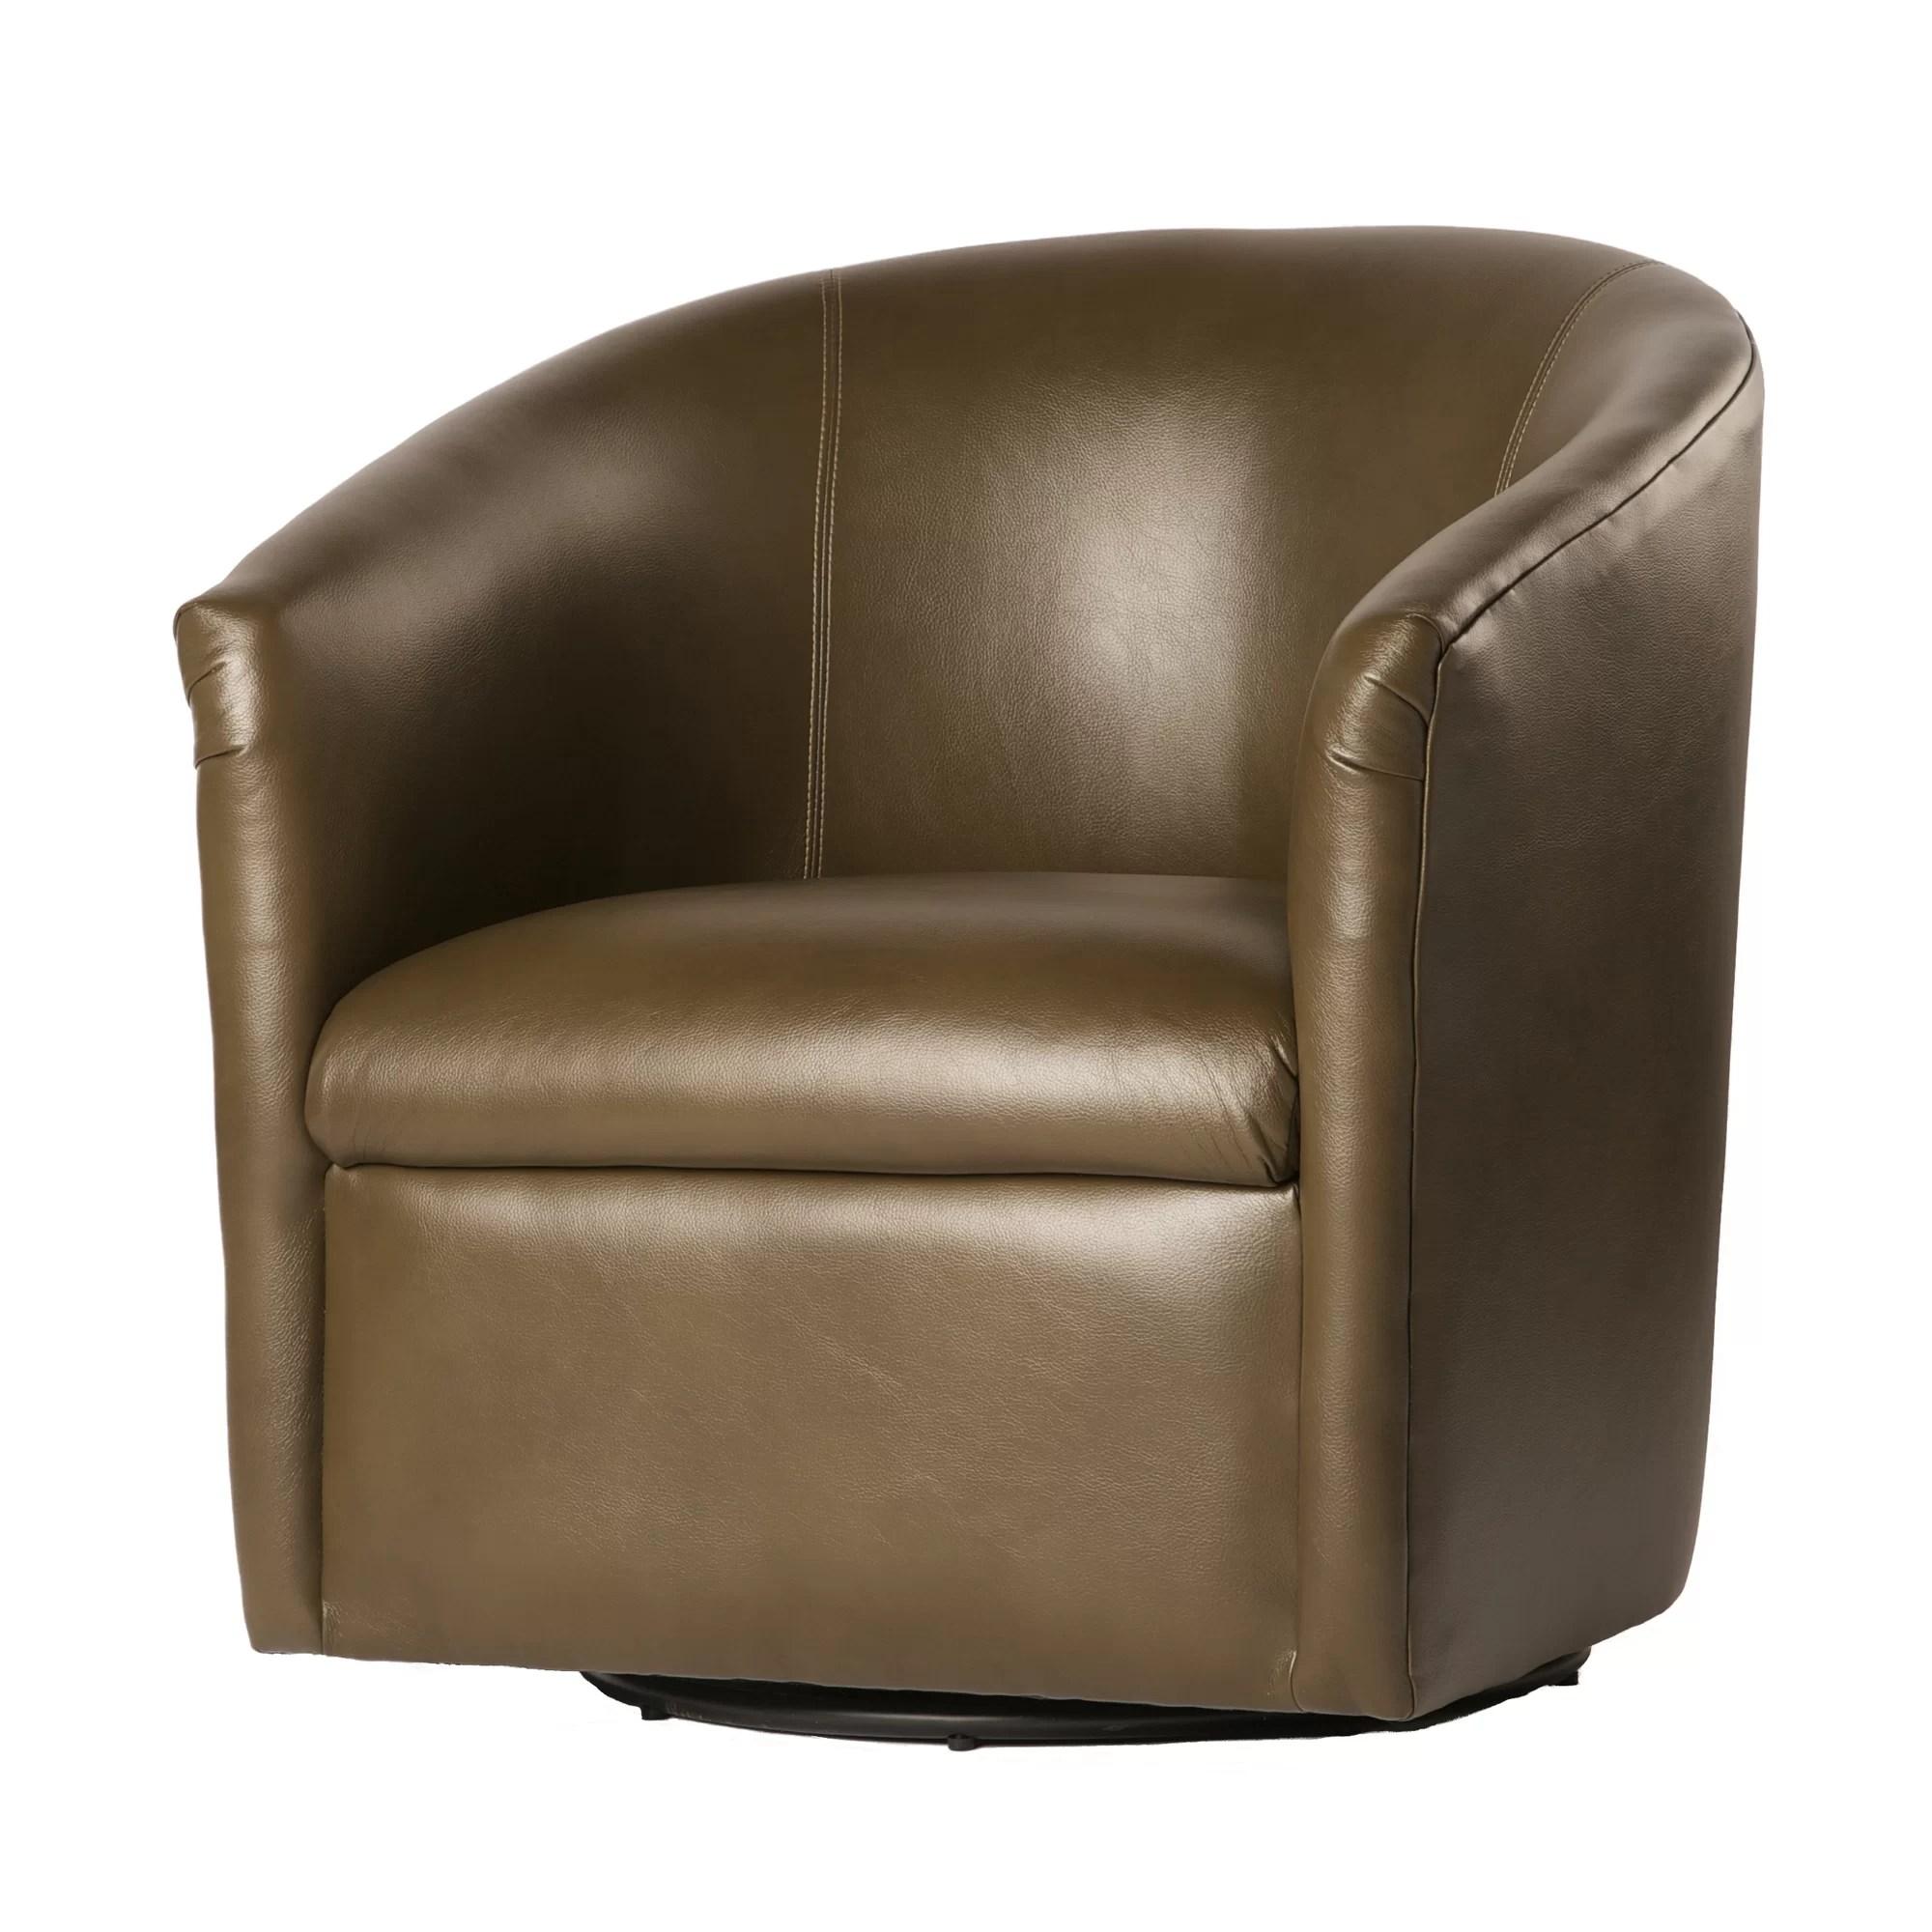 Comfort Pointe Draper Swivel Barrel Chair  eBay